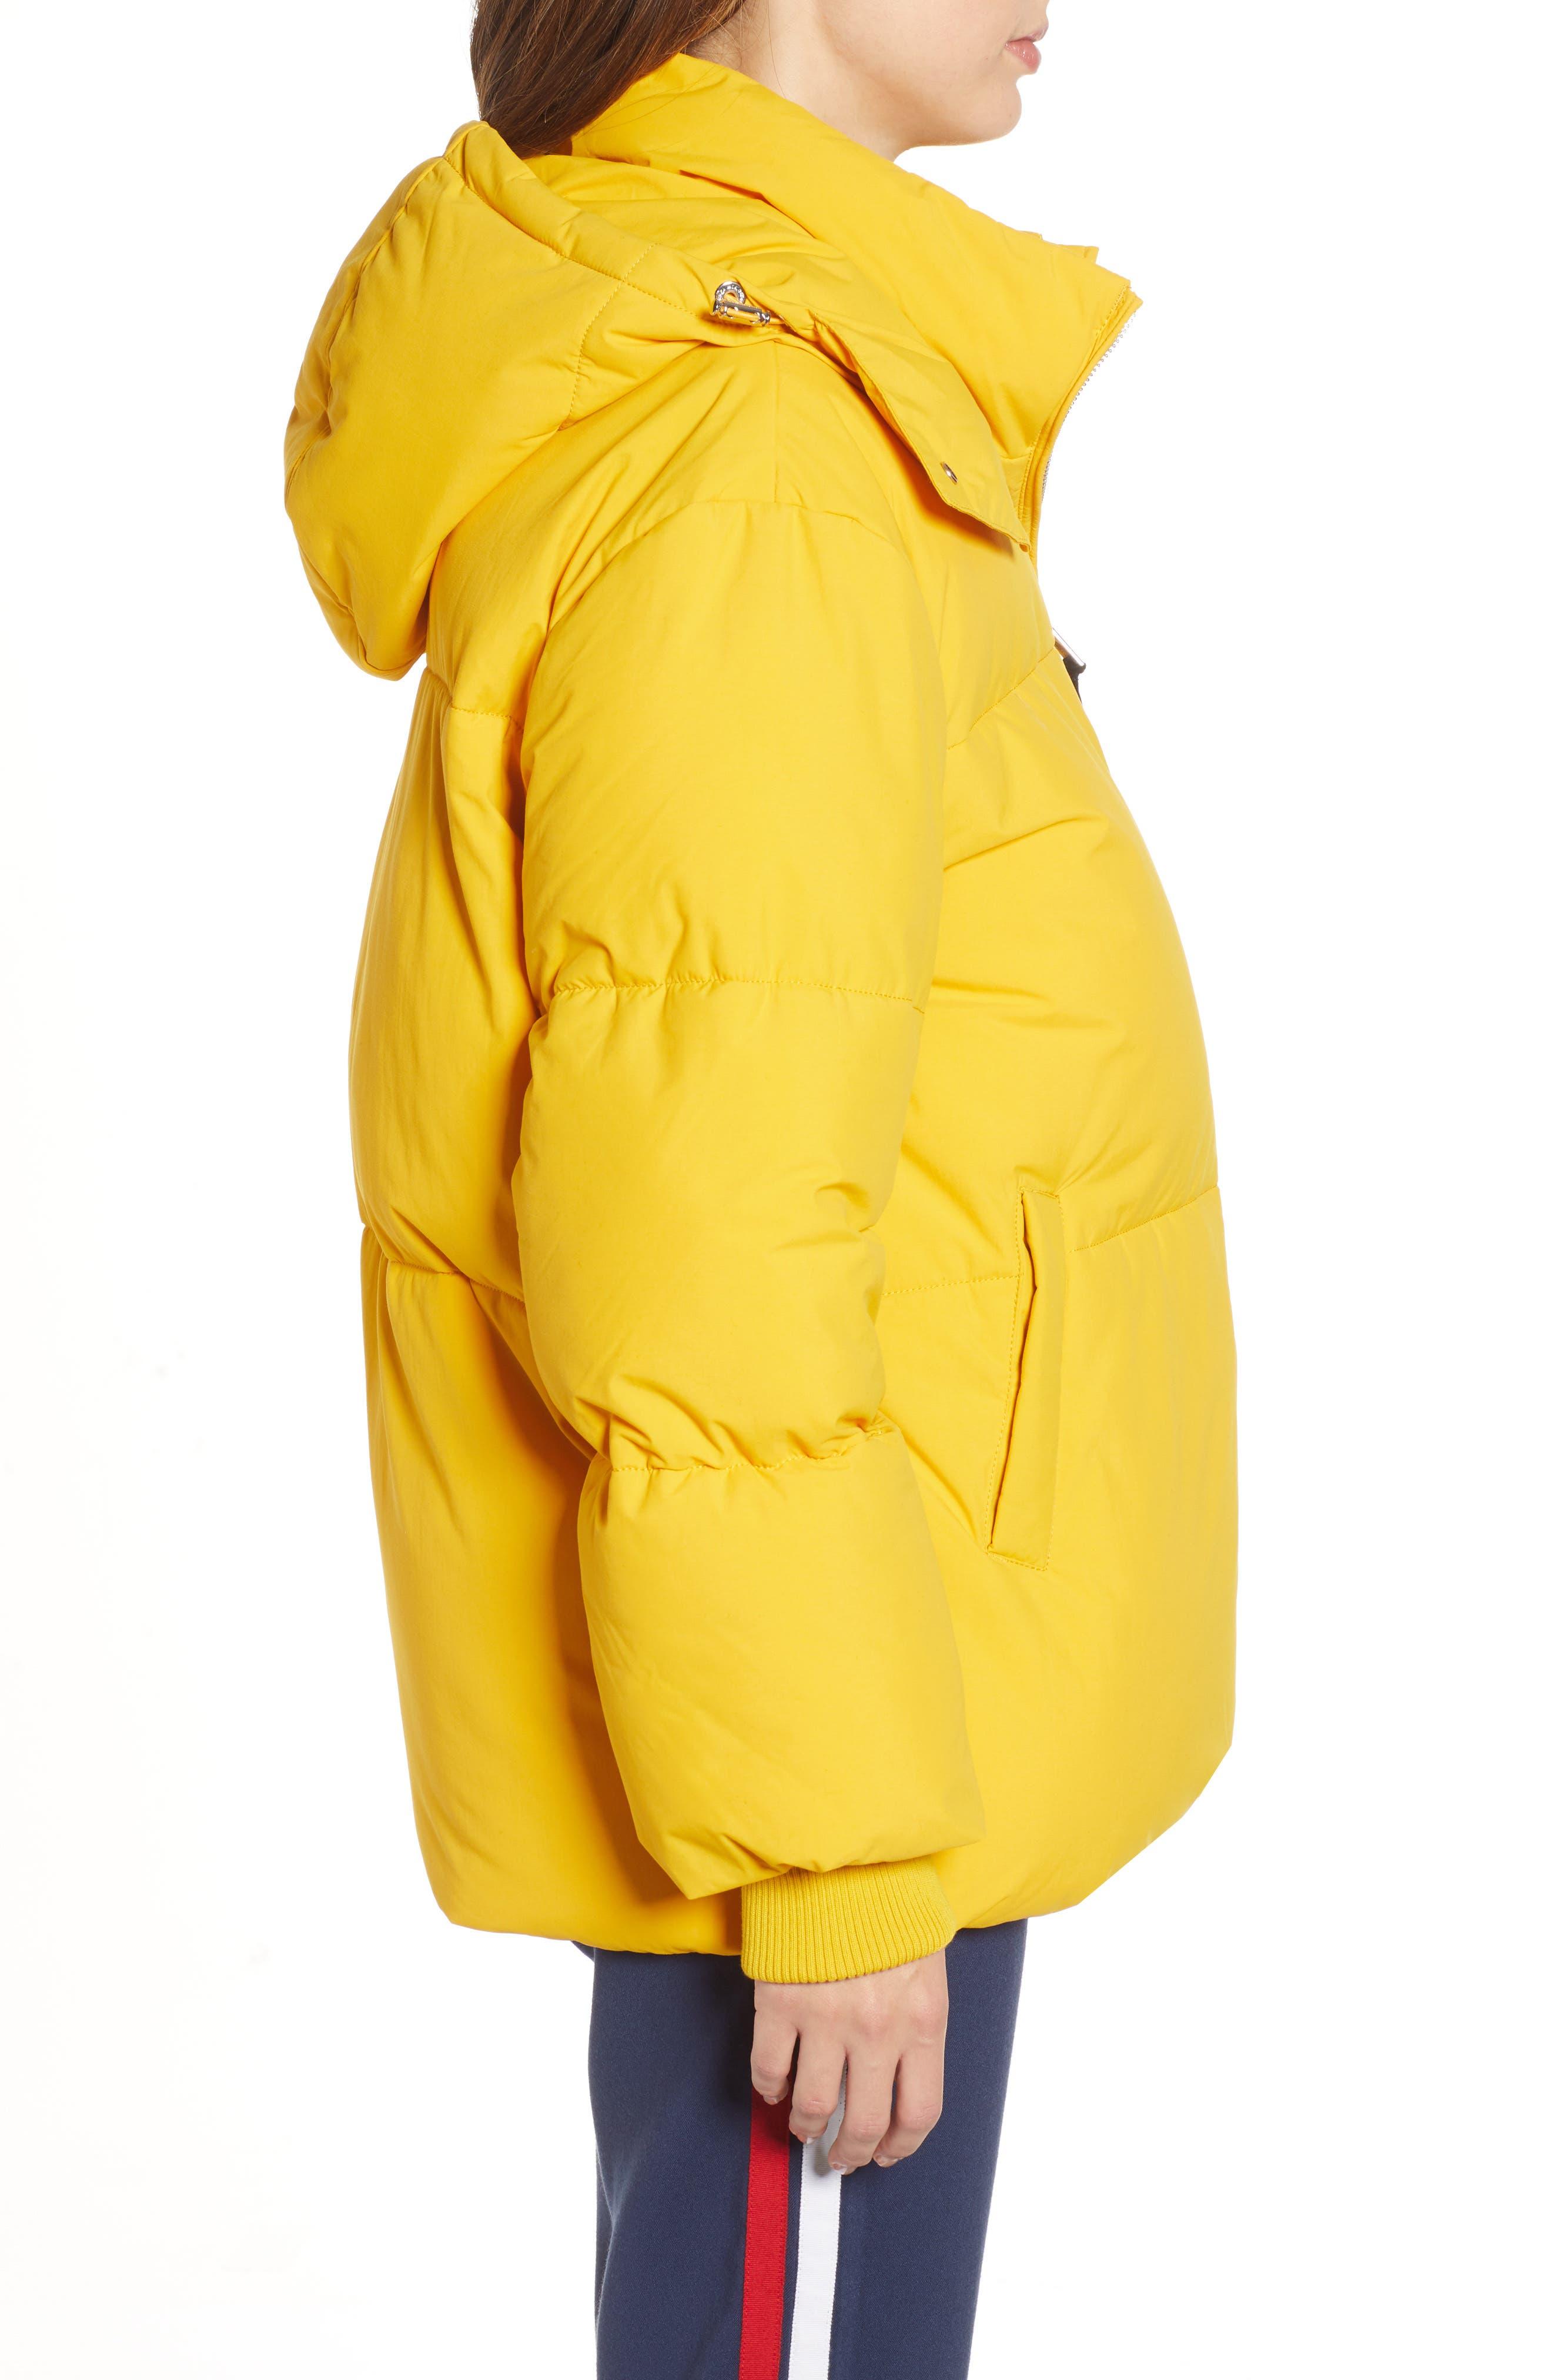 TJW Oversized Puffer Jacket,                             Alternate thumbnail 3, color,                             MANGO MOJITO